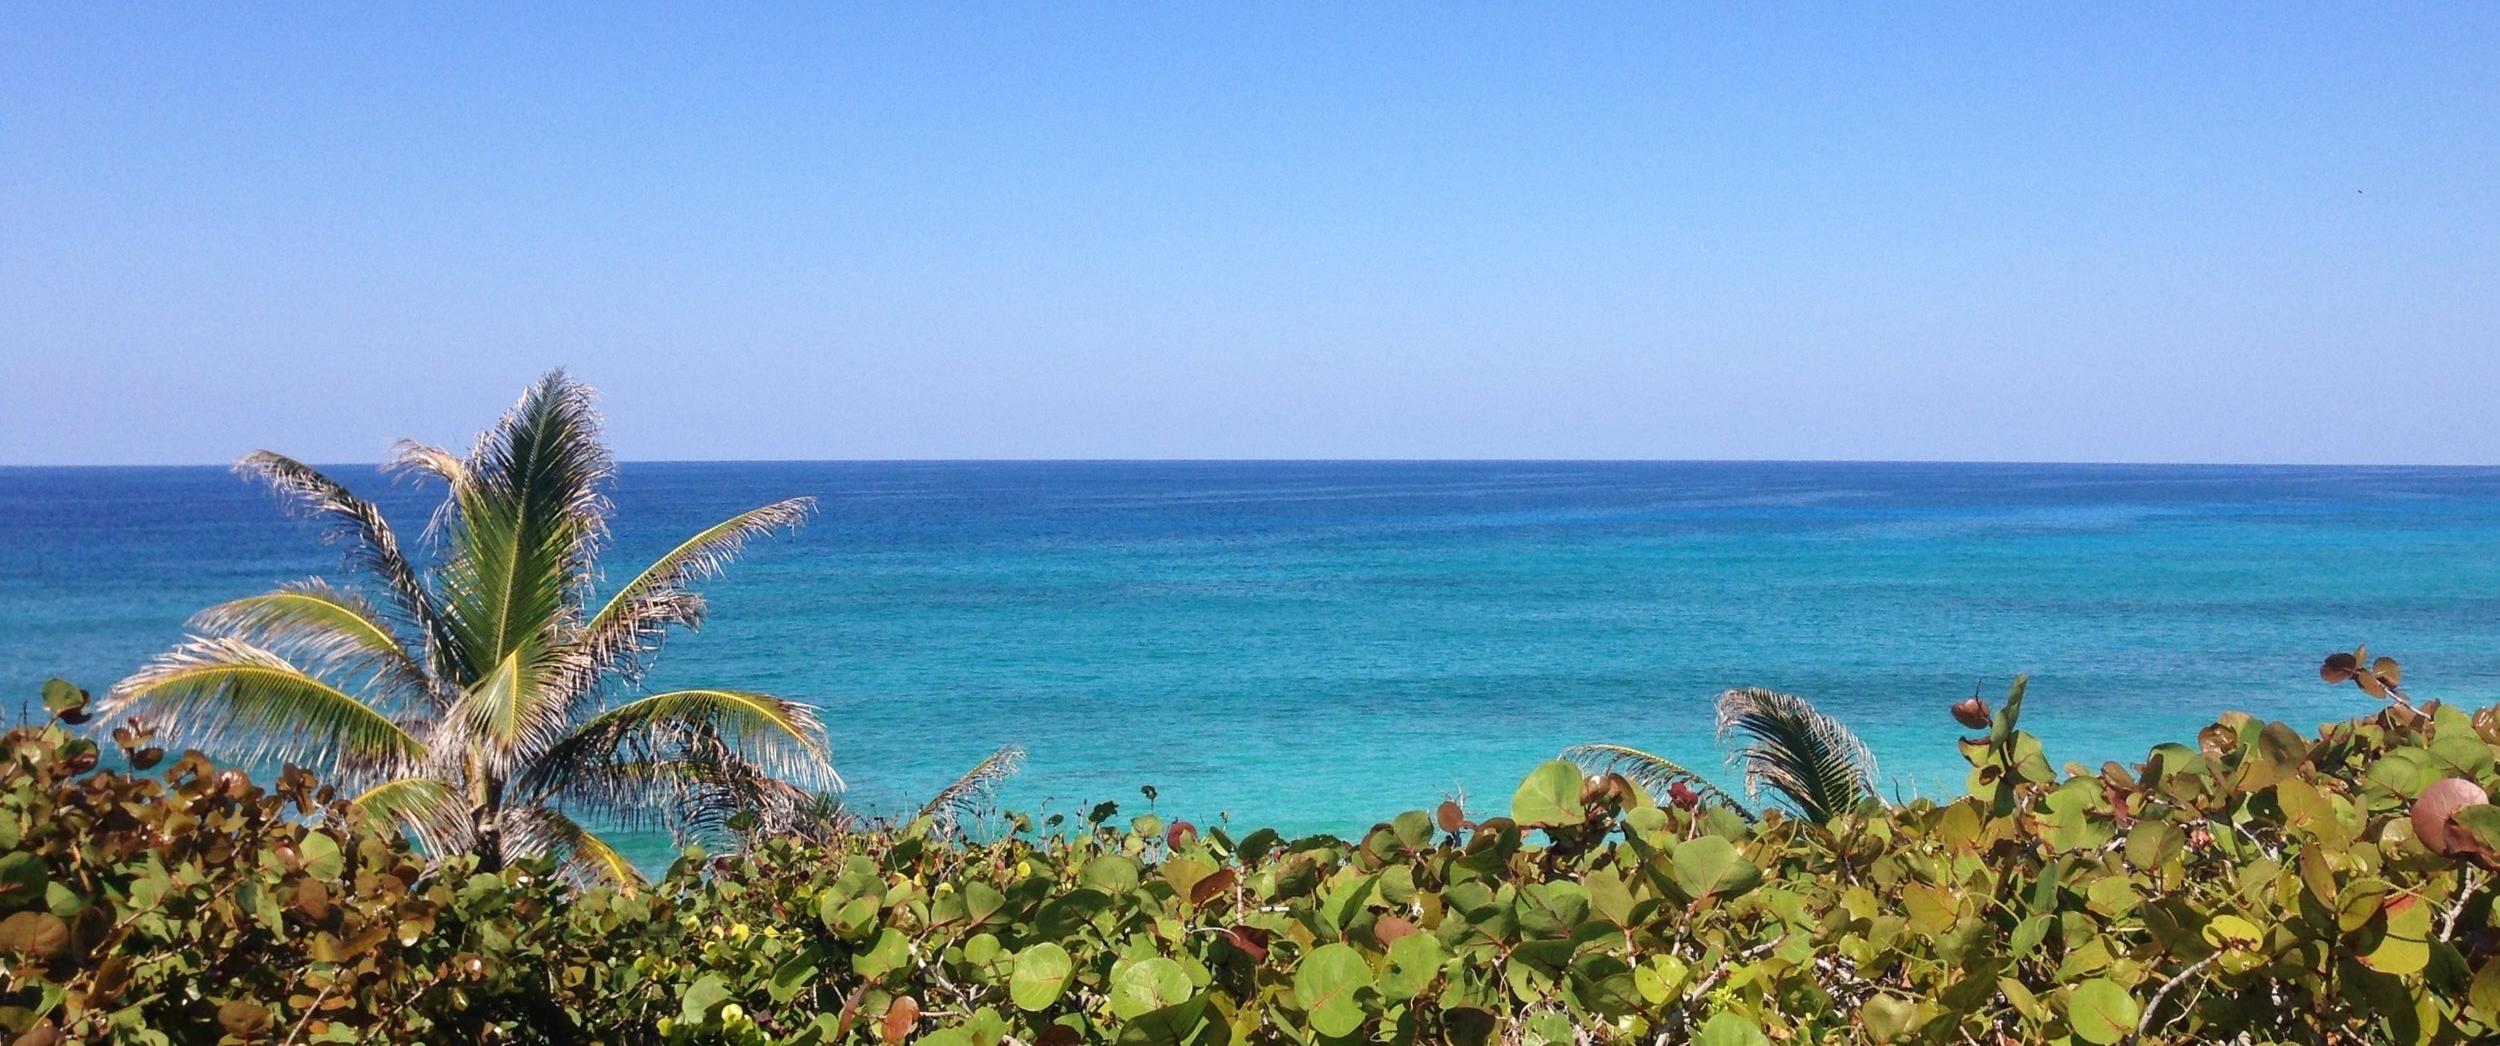 Crystal Clear Waters of the Exuma Bahamas